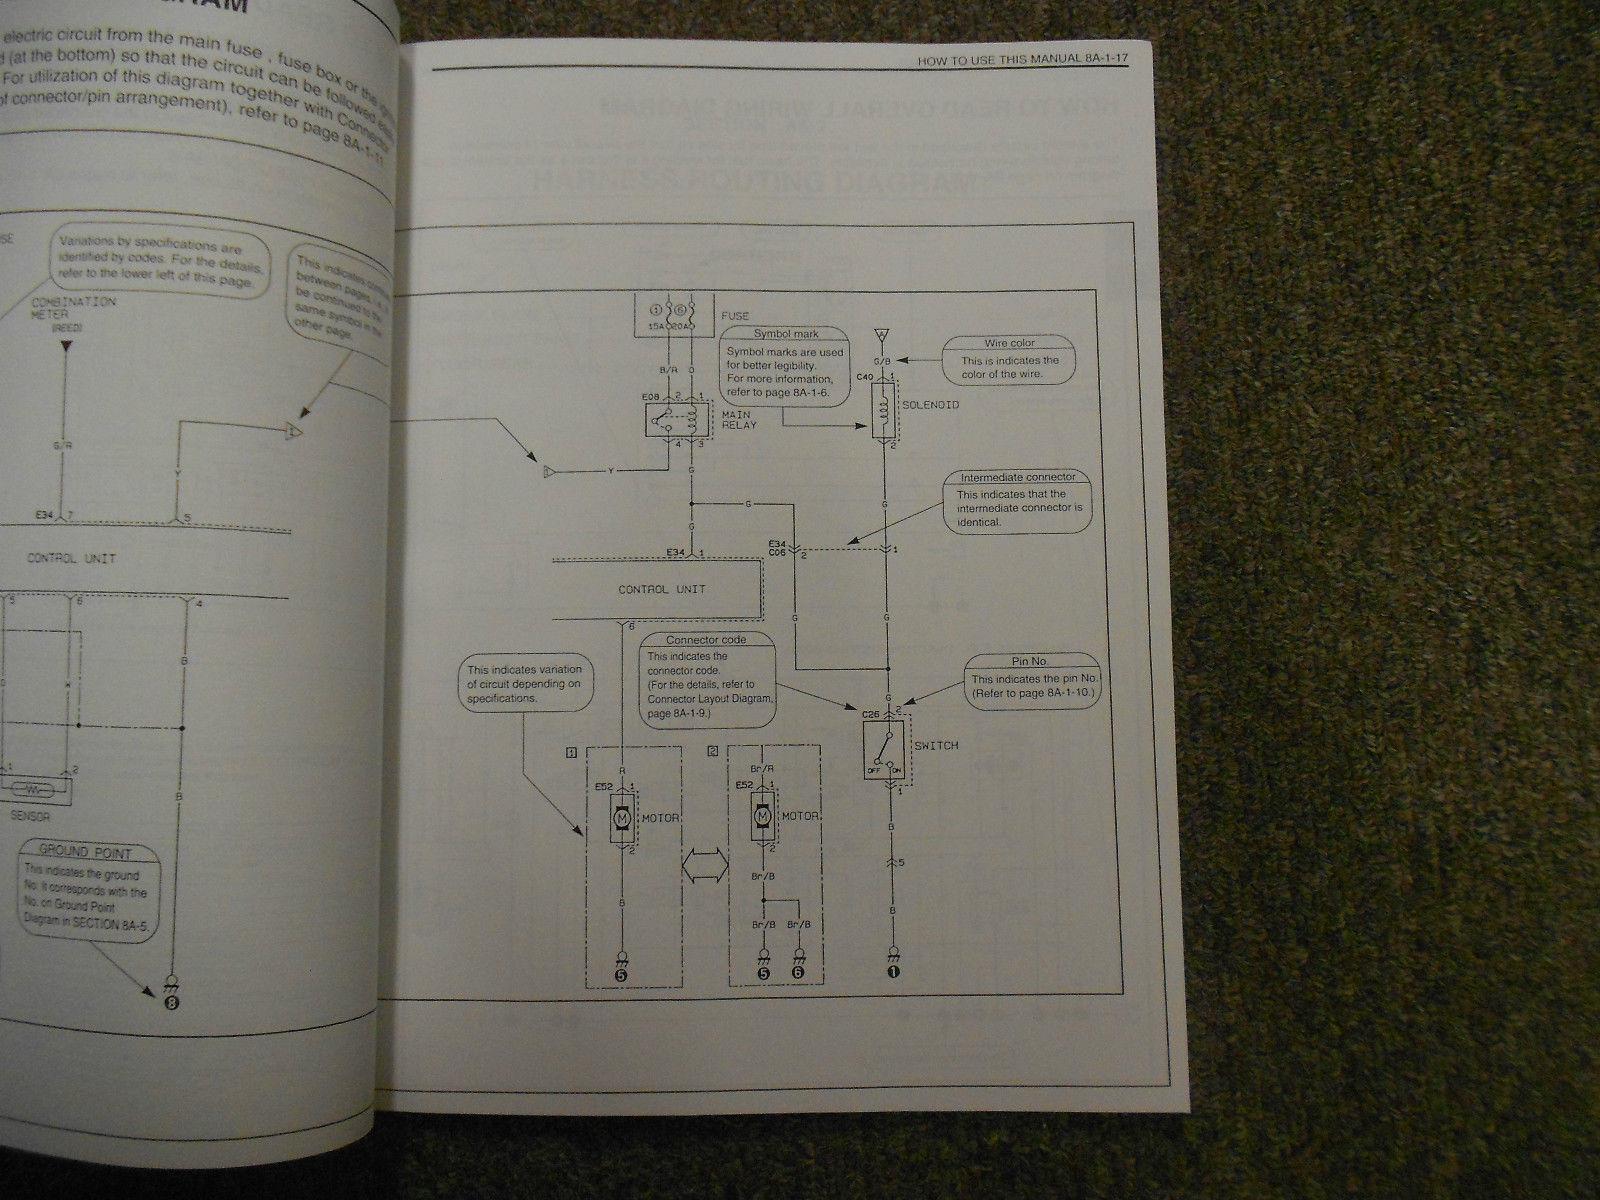 1995 Suzuki Esteem Wiring Diagram Shop Manual FACTORY OEM BOOK 95 2ND ED U.S VOL image 11